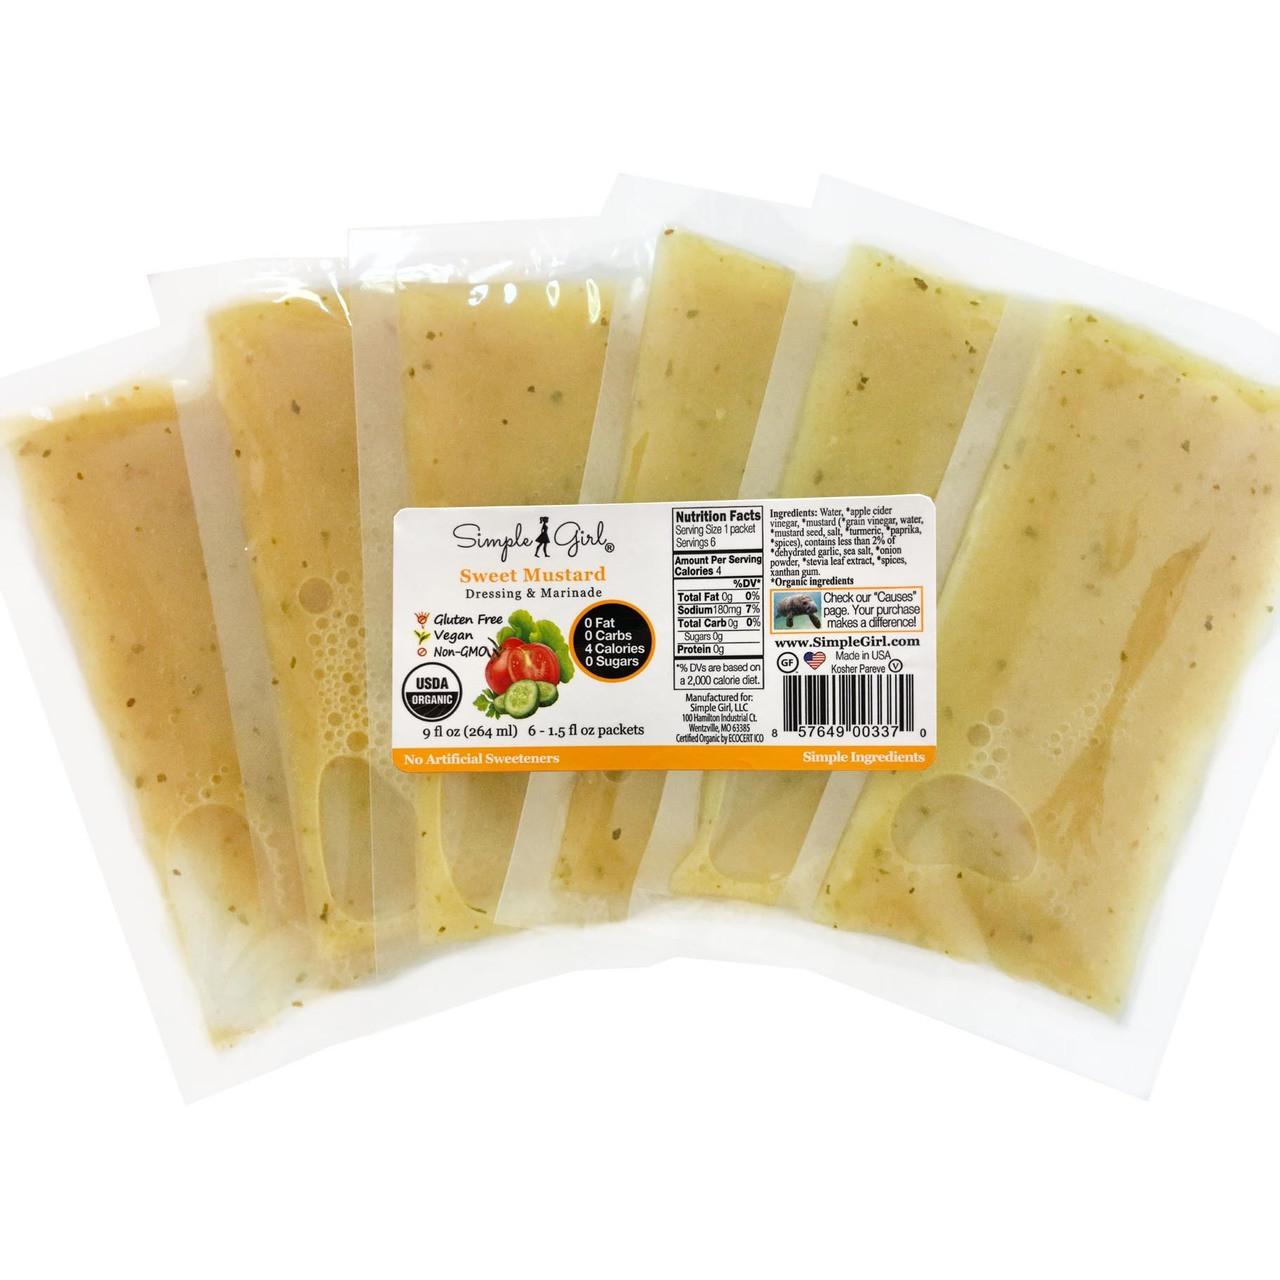 Simple Girl Organic Sweet Mustard Salad Dressing - Single Serve Packets